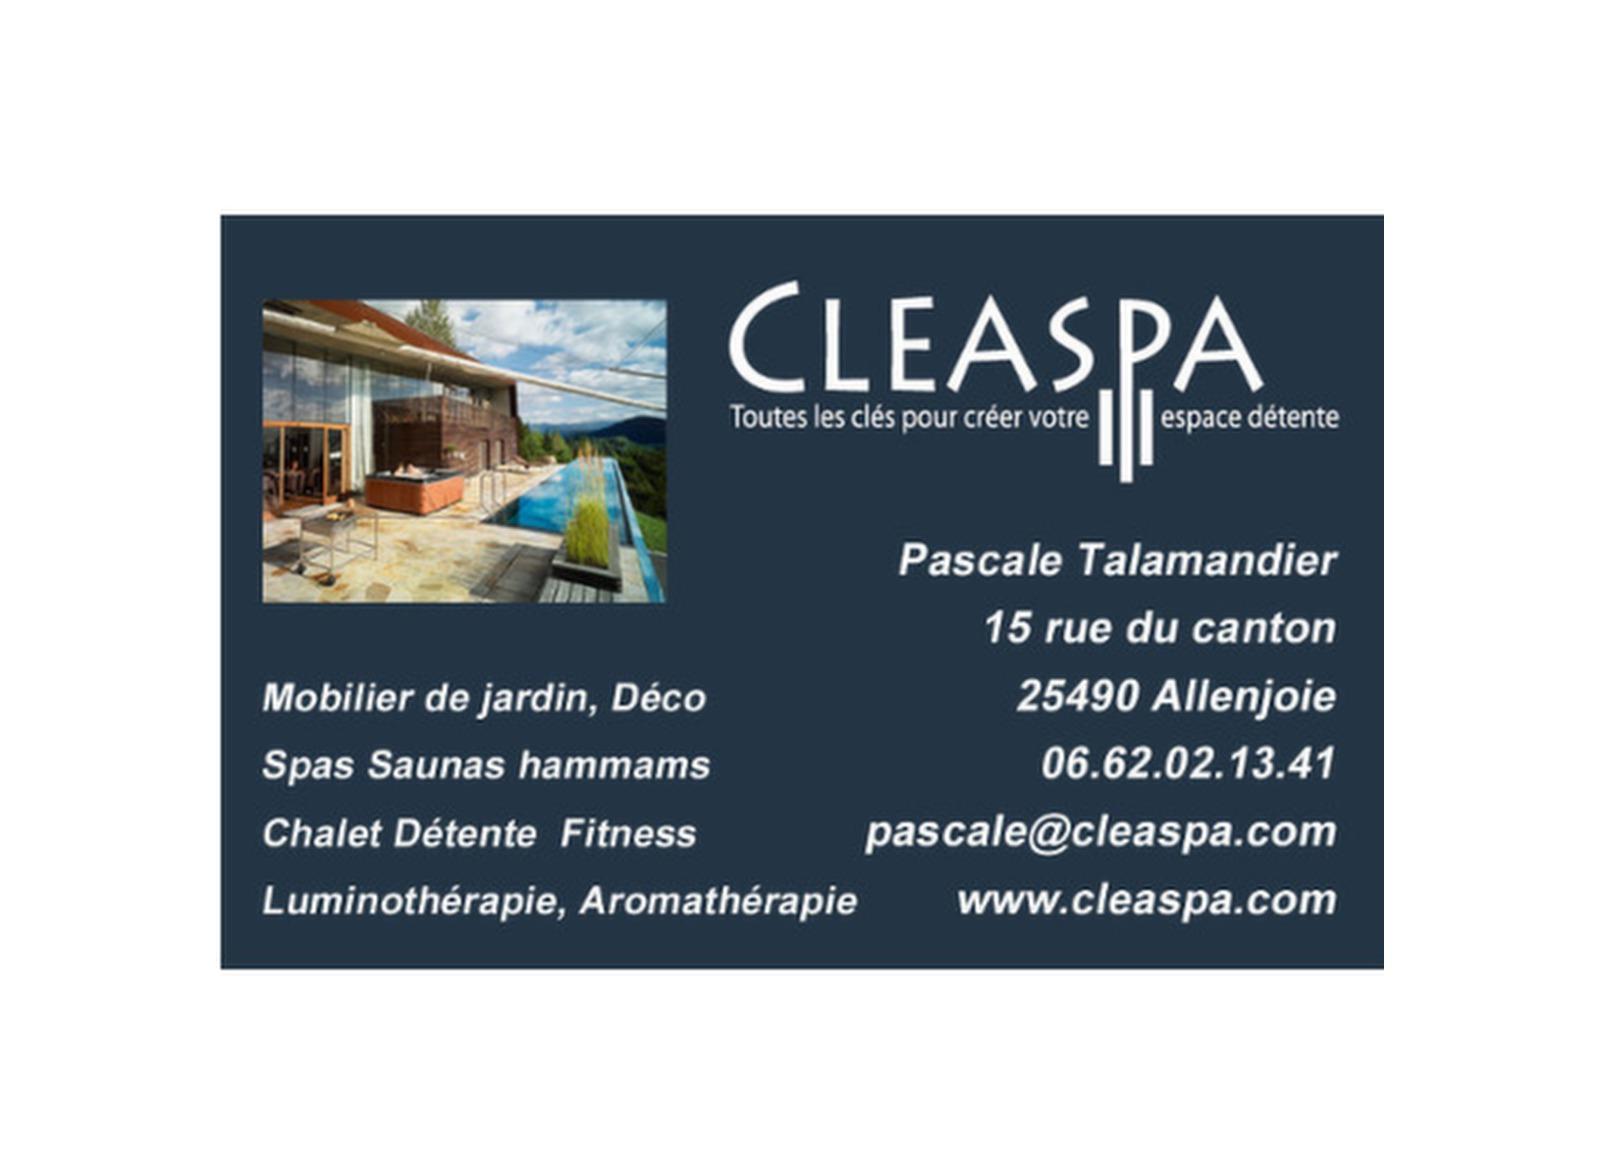 CLEASPA PASCALE TALAMANDIER